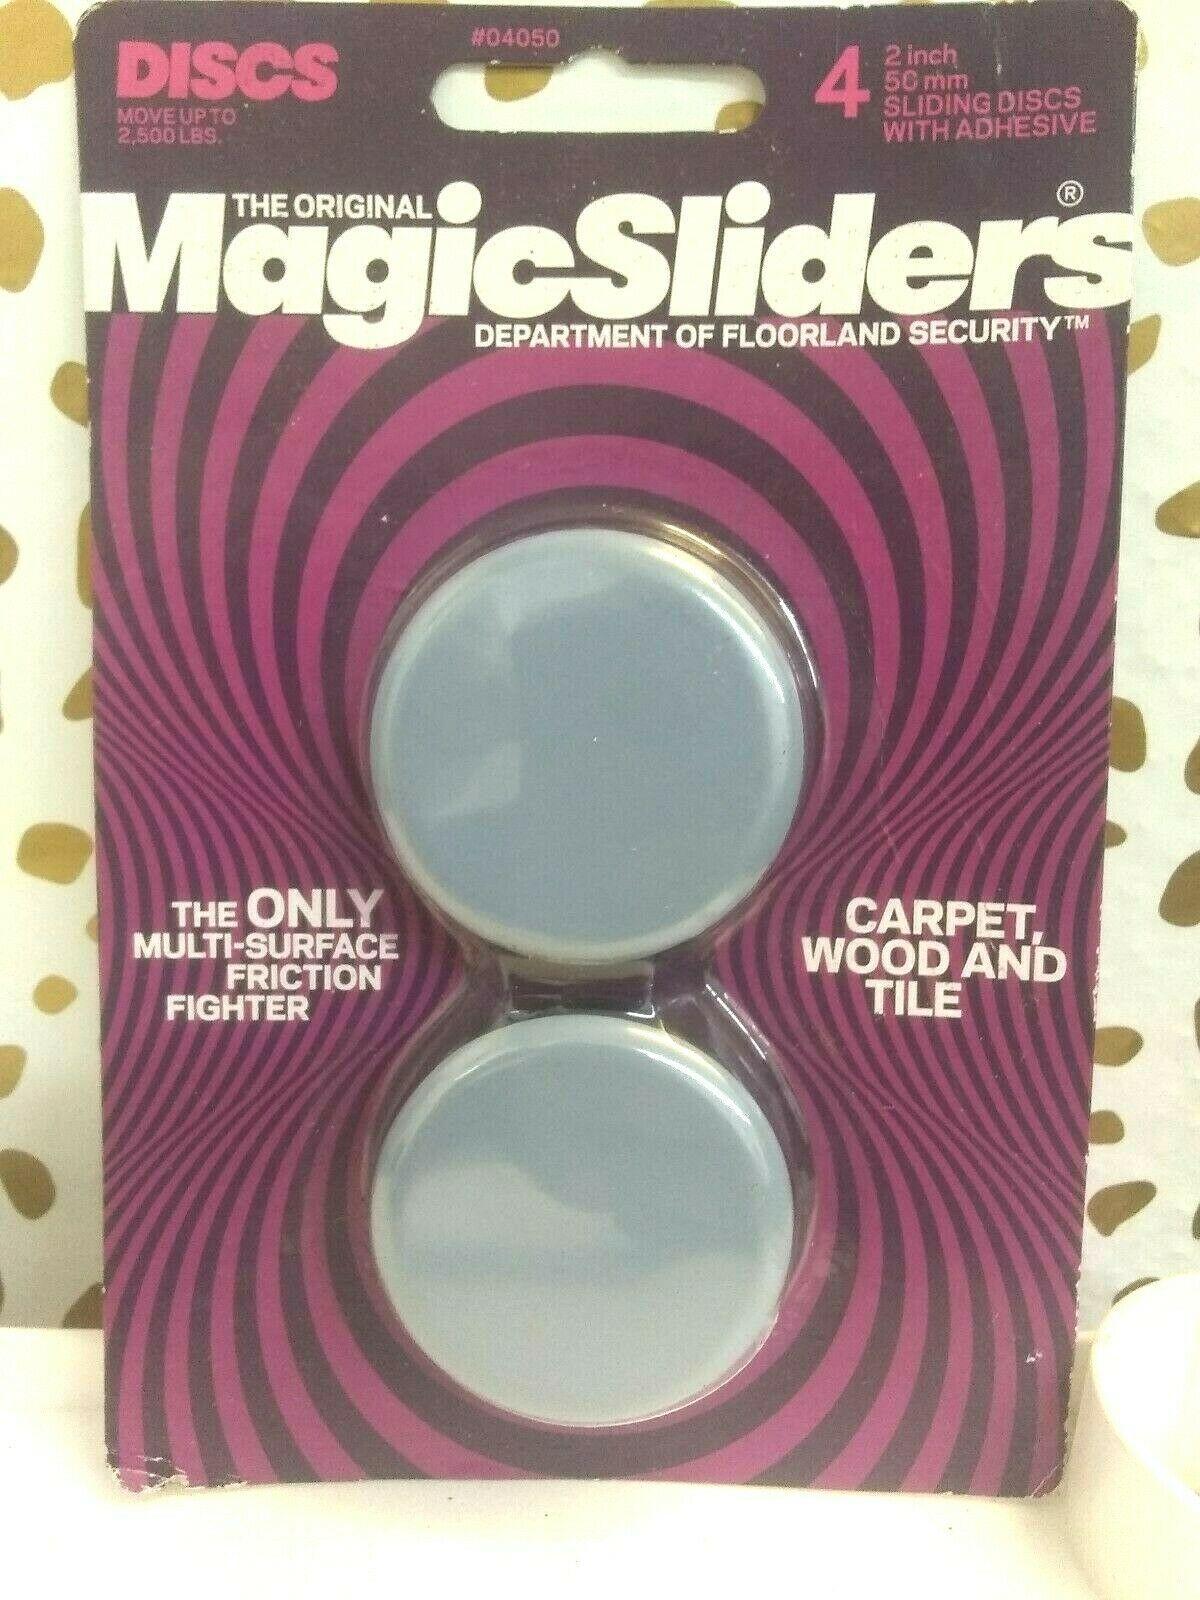 Magic Sliders 4 pack  2 In. Discs Self Adhesive Furniture Glide (SEALED)STORE